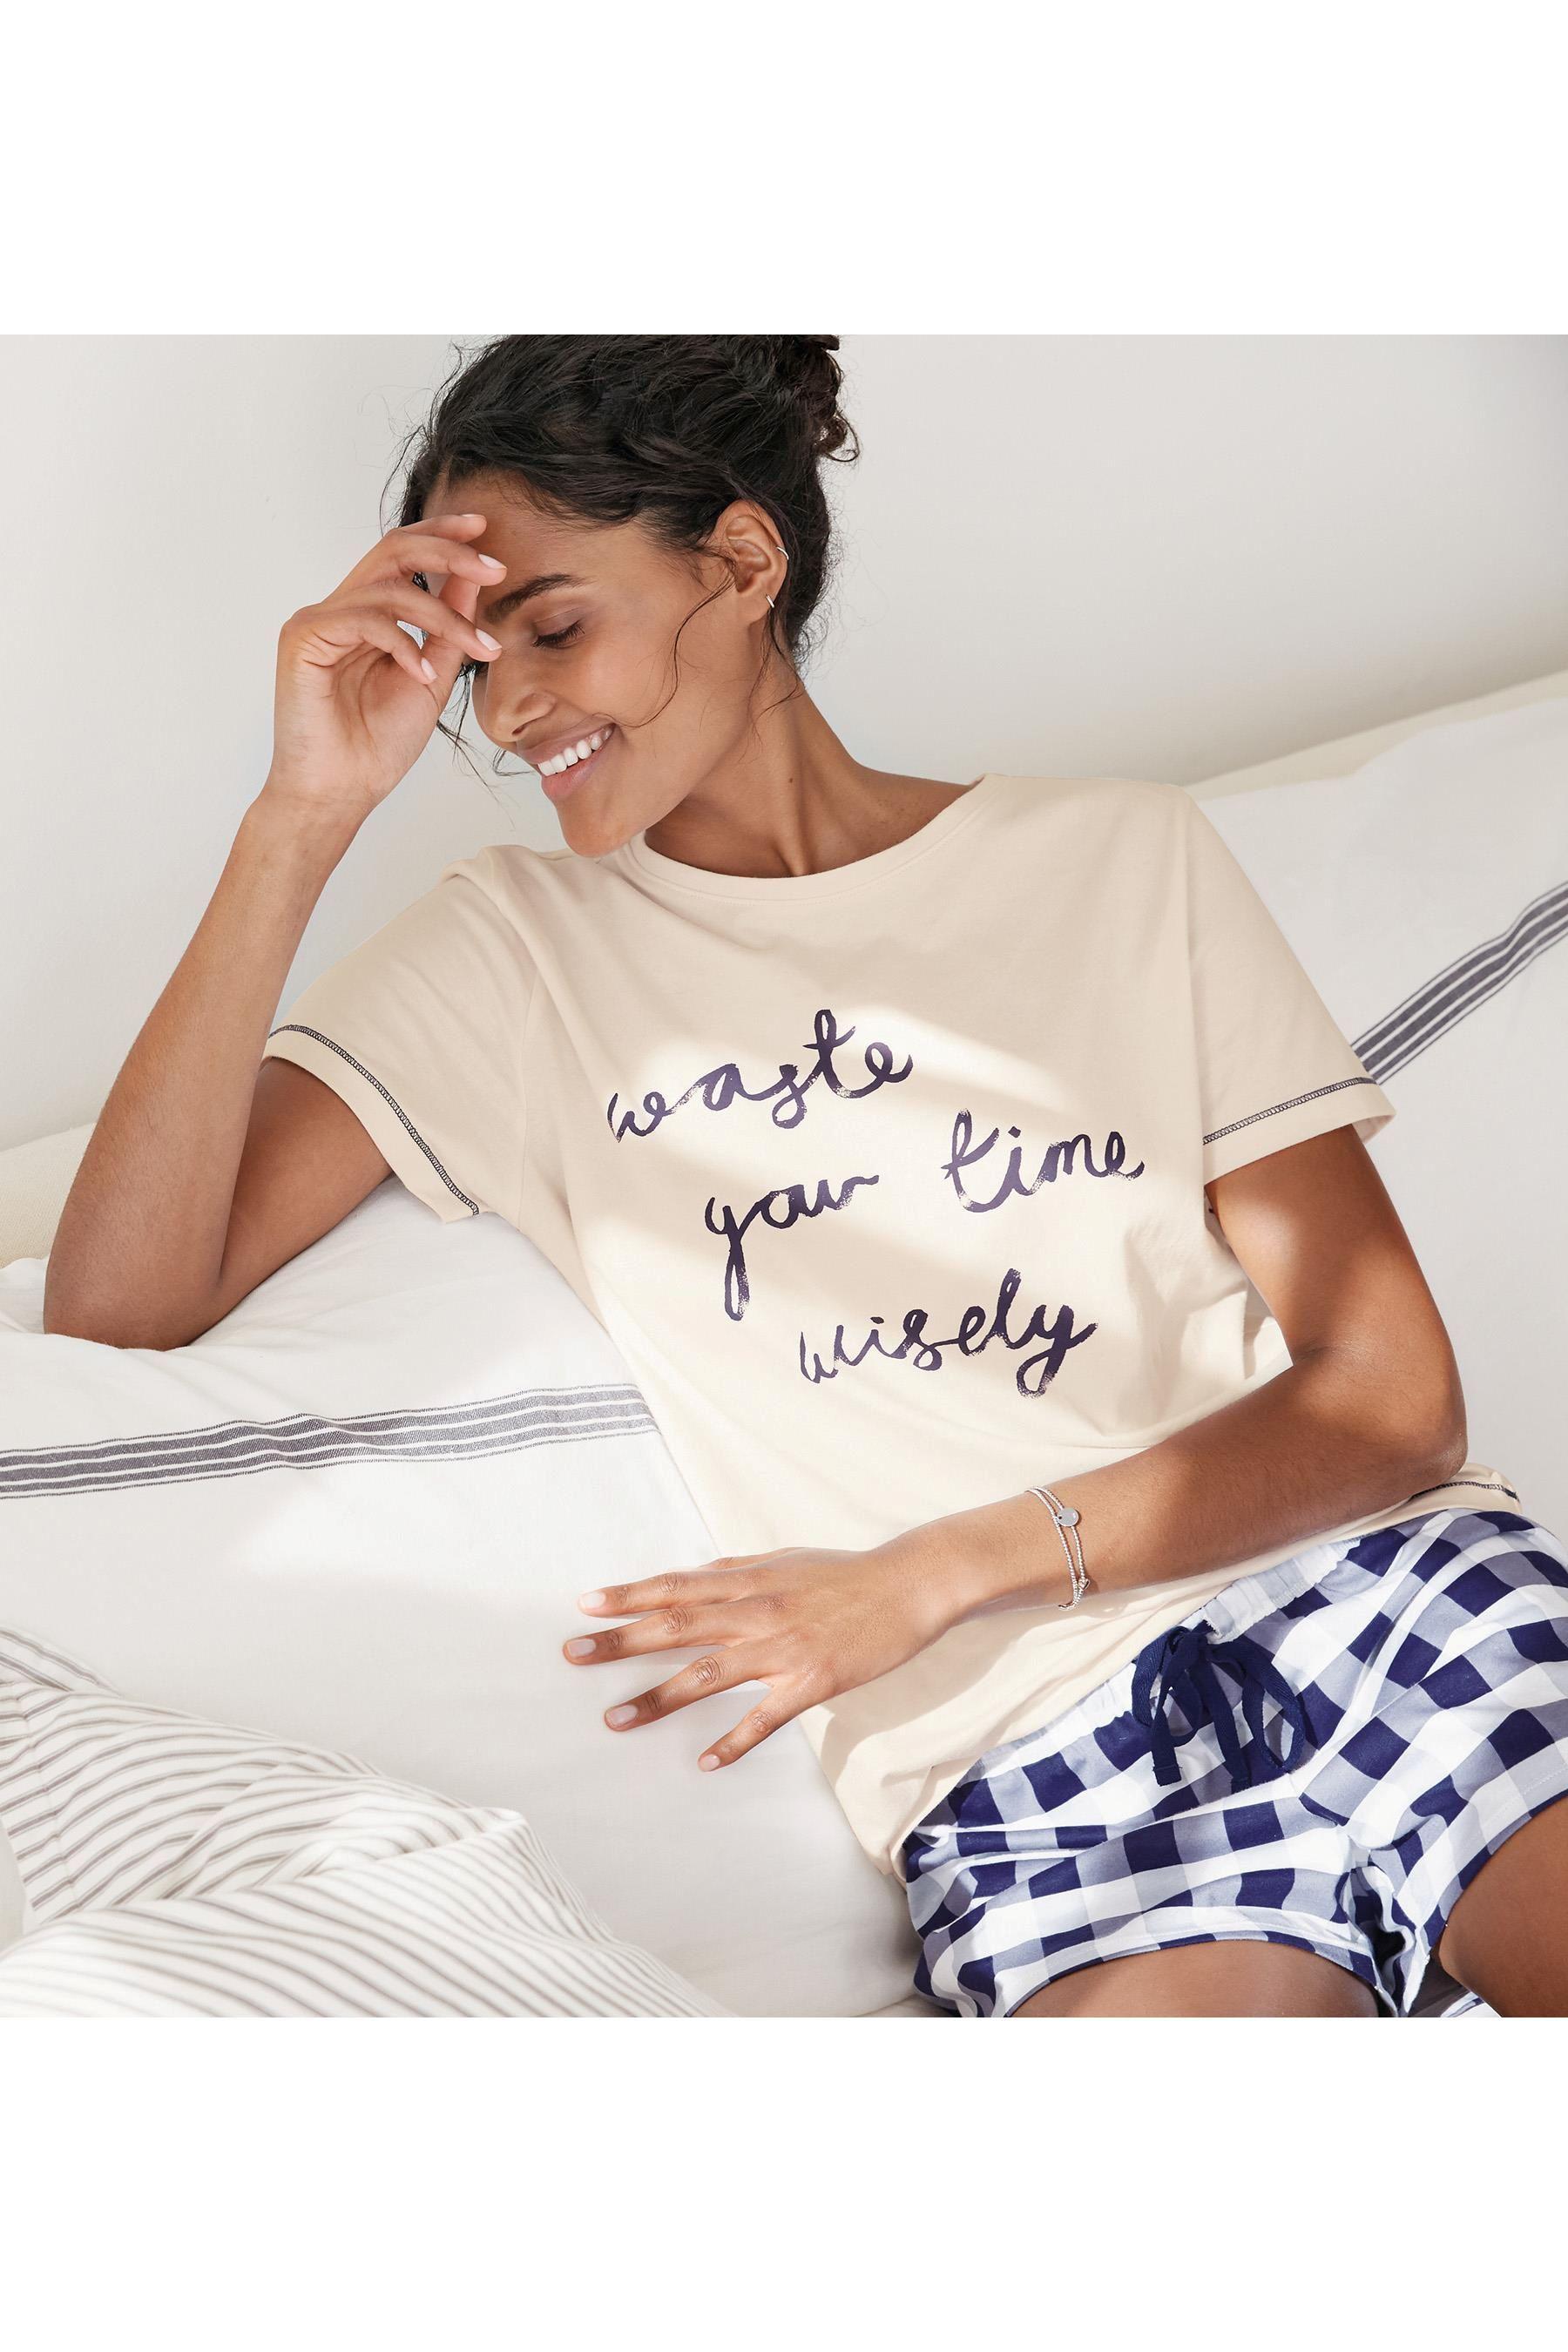 48a97b4f7411 Buy White Blue Slogan Cotton Short Set from the Next UK online shop ...